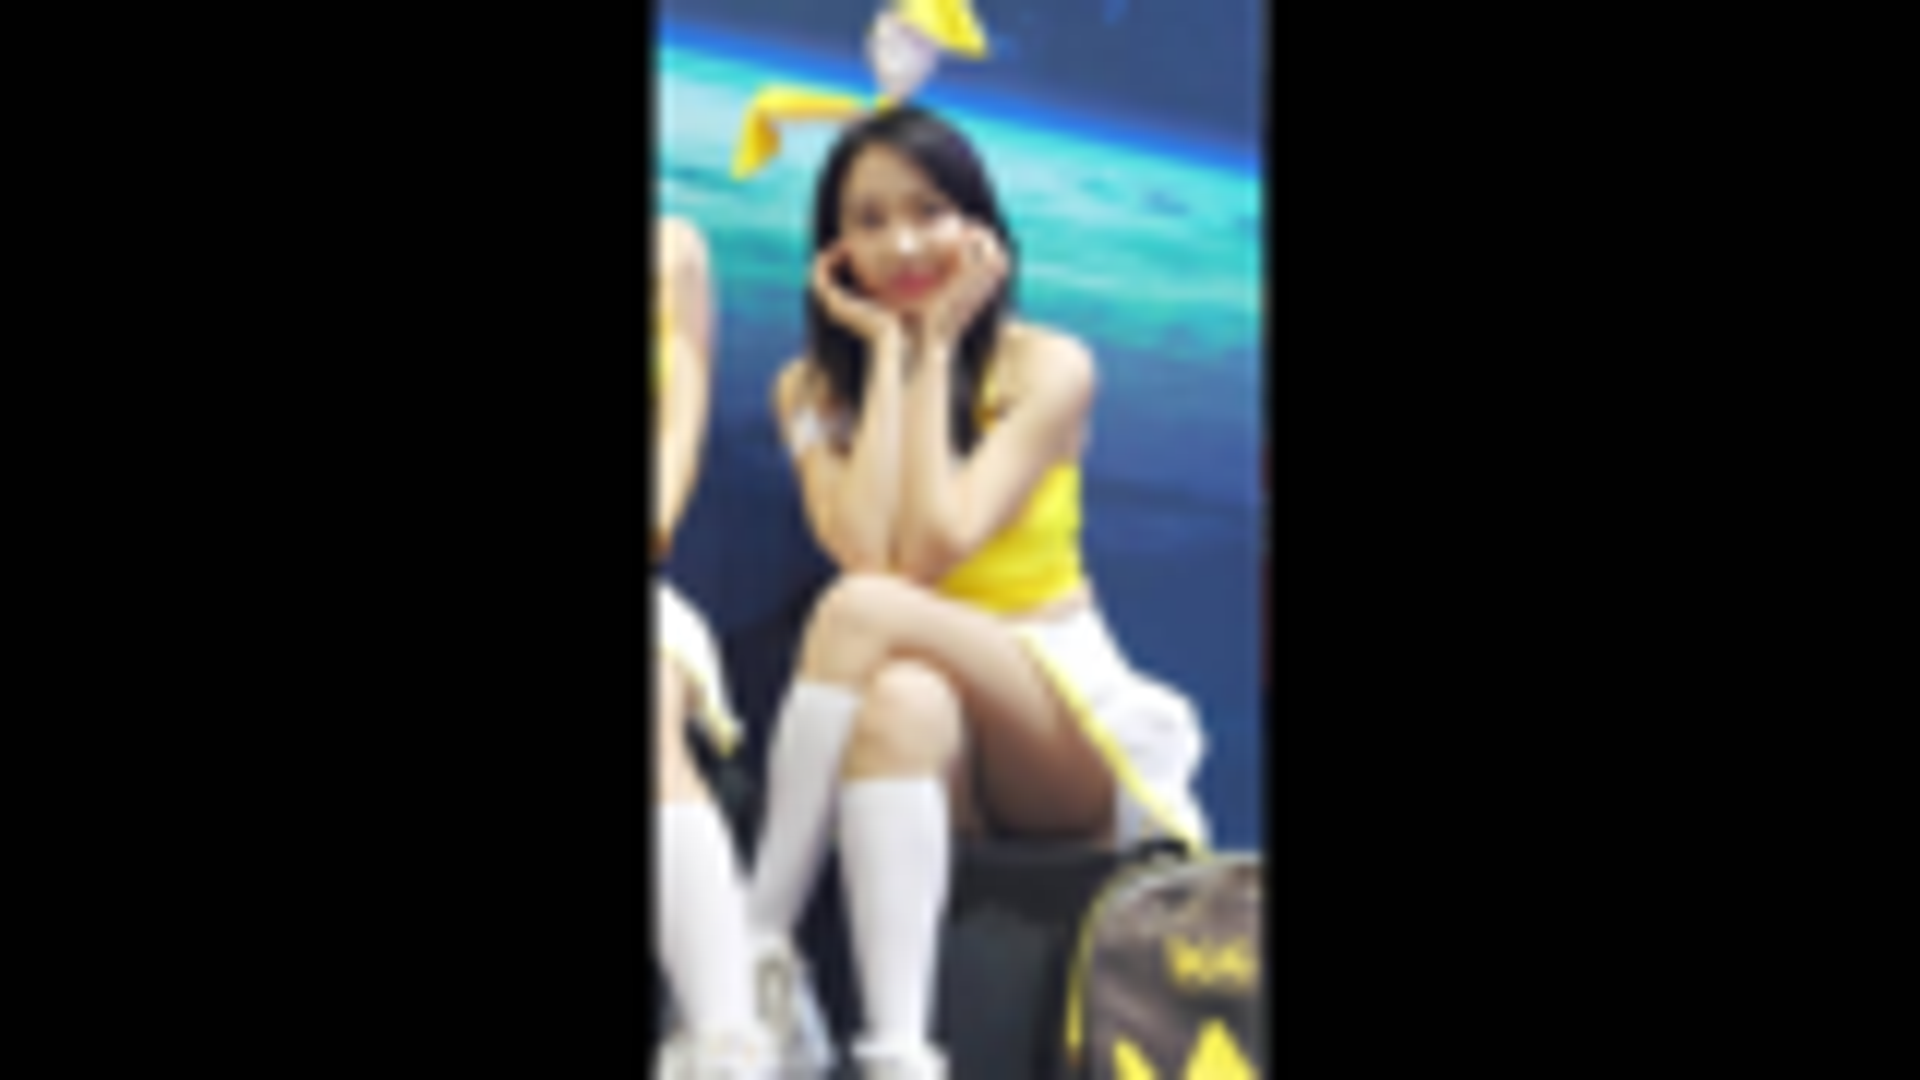 2019 G-STAR游戏展 - 김다나[Kim Dana]  Cosplay 可爱兔女郎